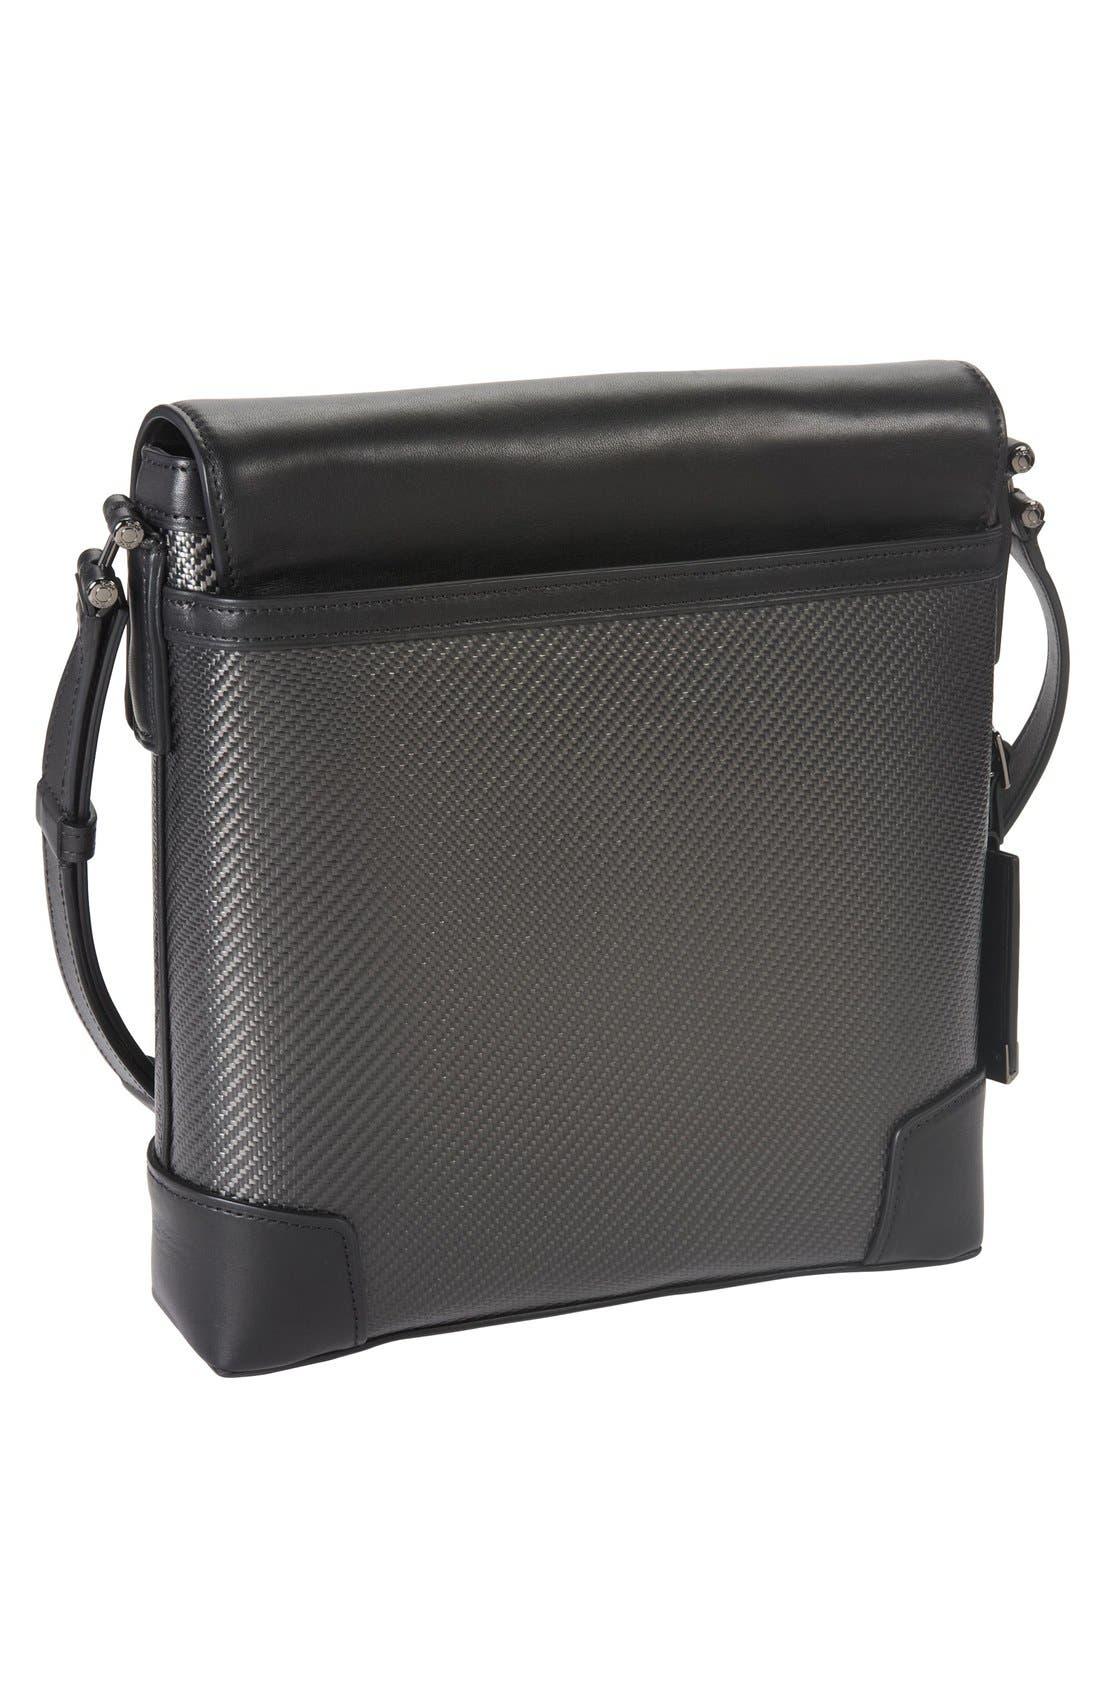 Alternate Image 2  - Tumi 'CFX - Suzuka' Carbon Fiber Crossbody Bag